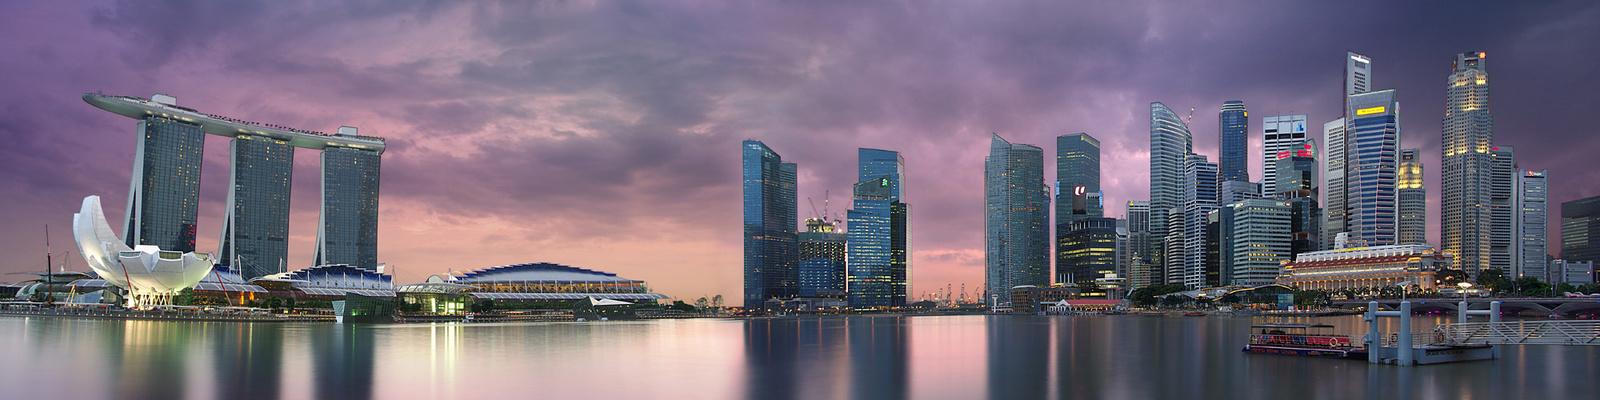 Singapore - Marina Bay View